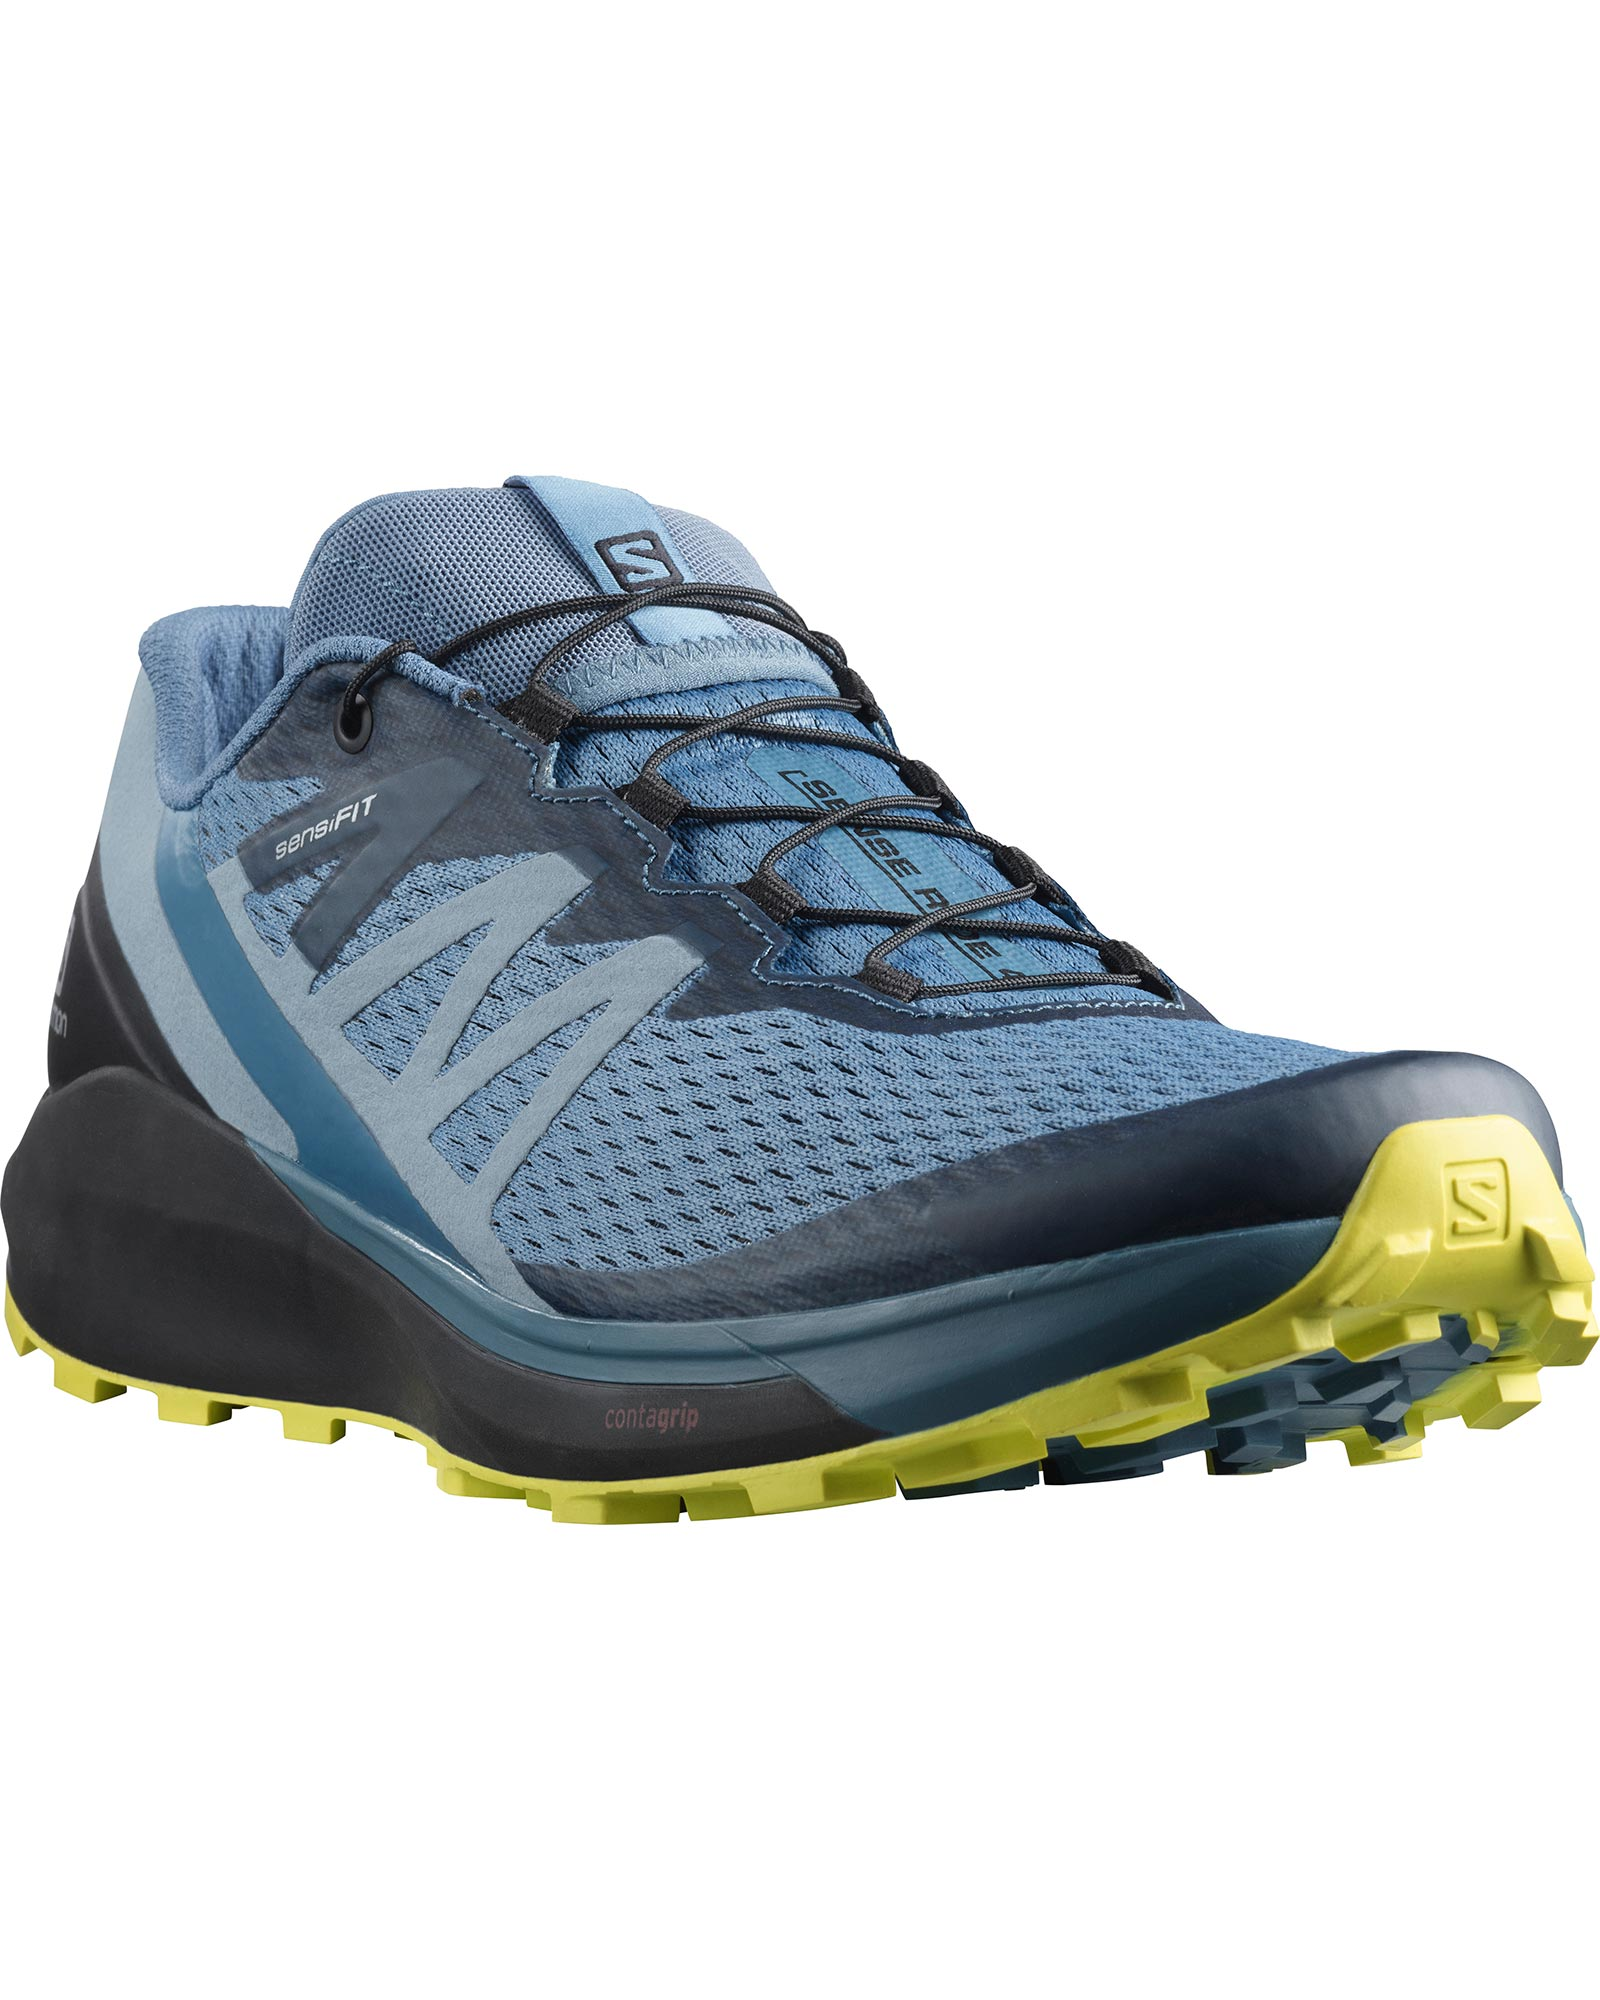 Salomon Sense Ride 4 Men's Shoes 0